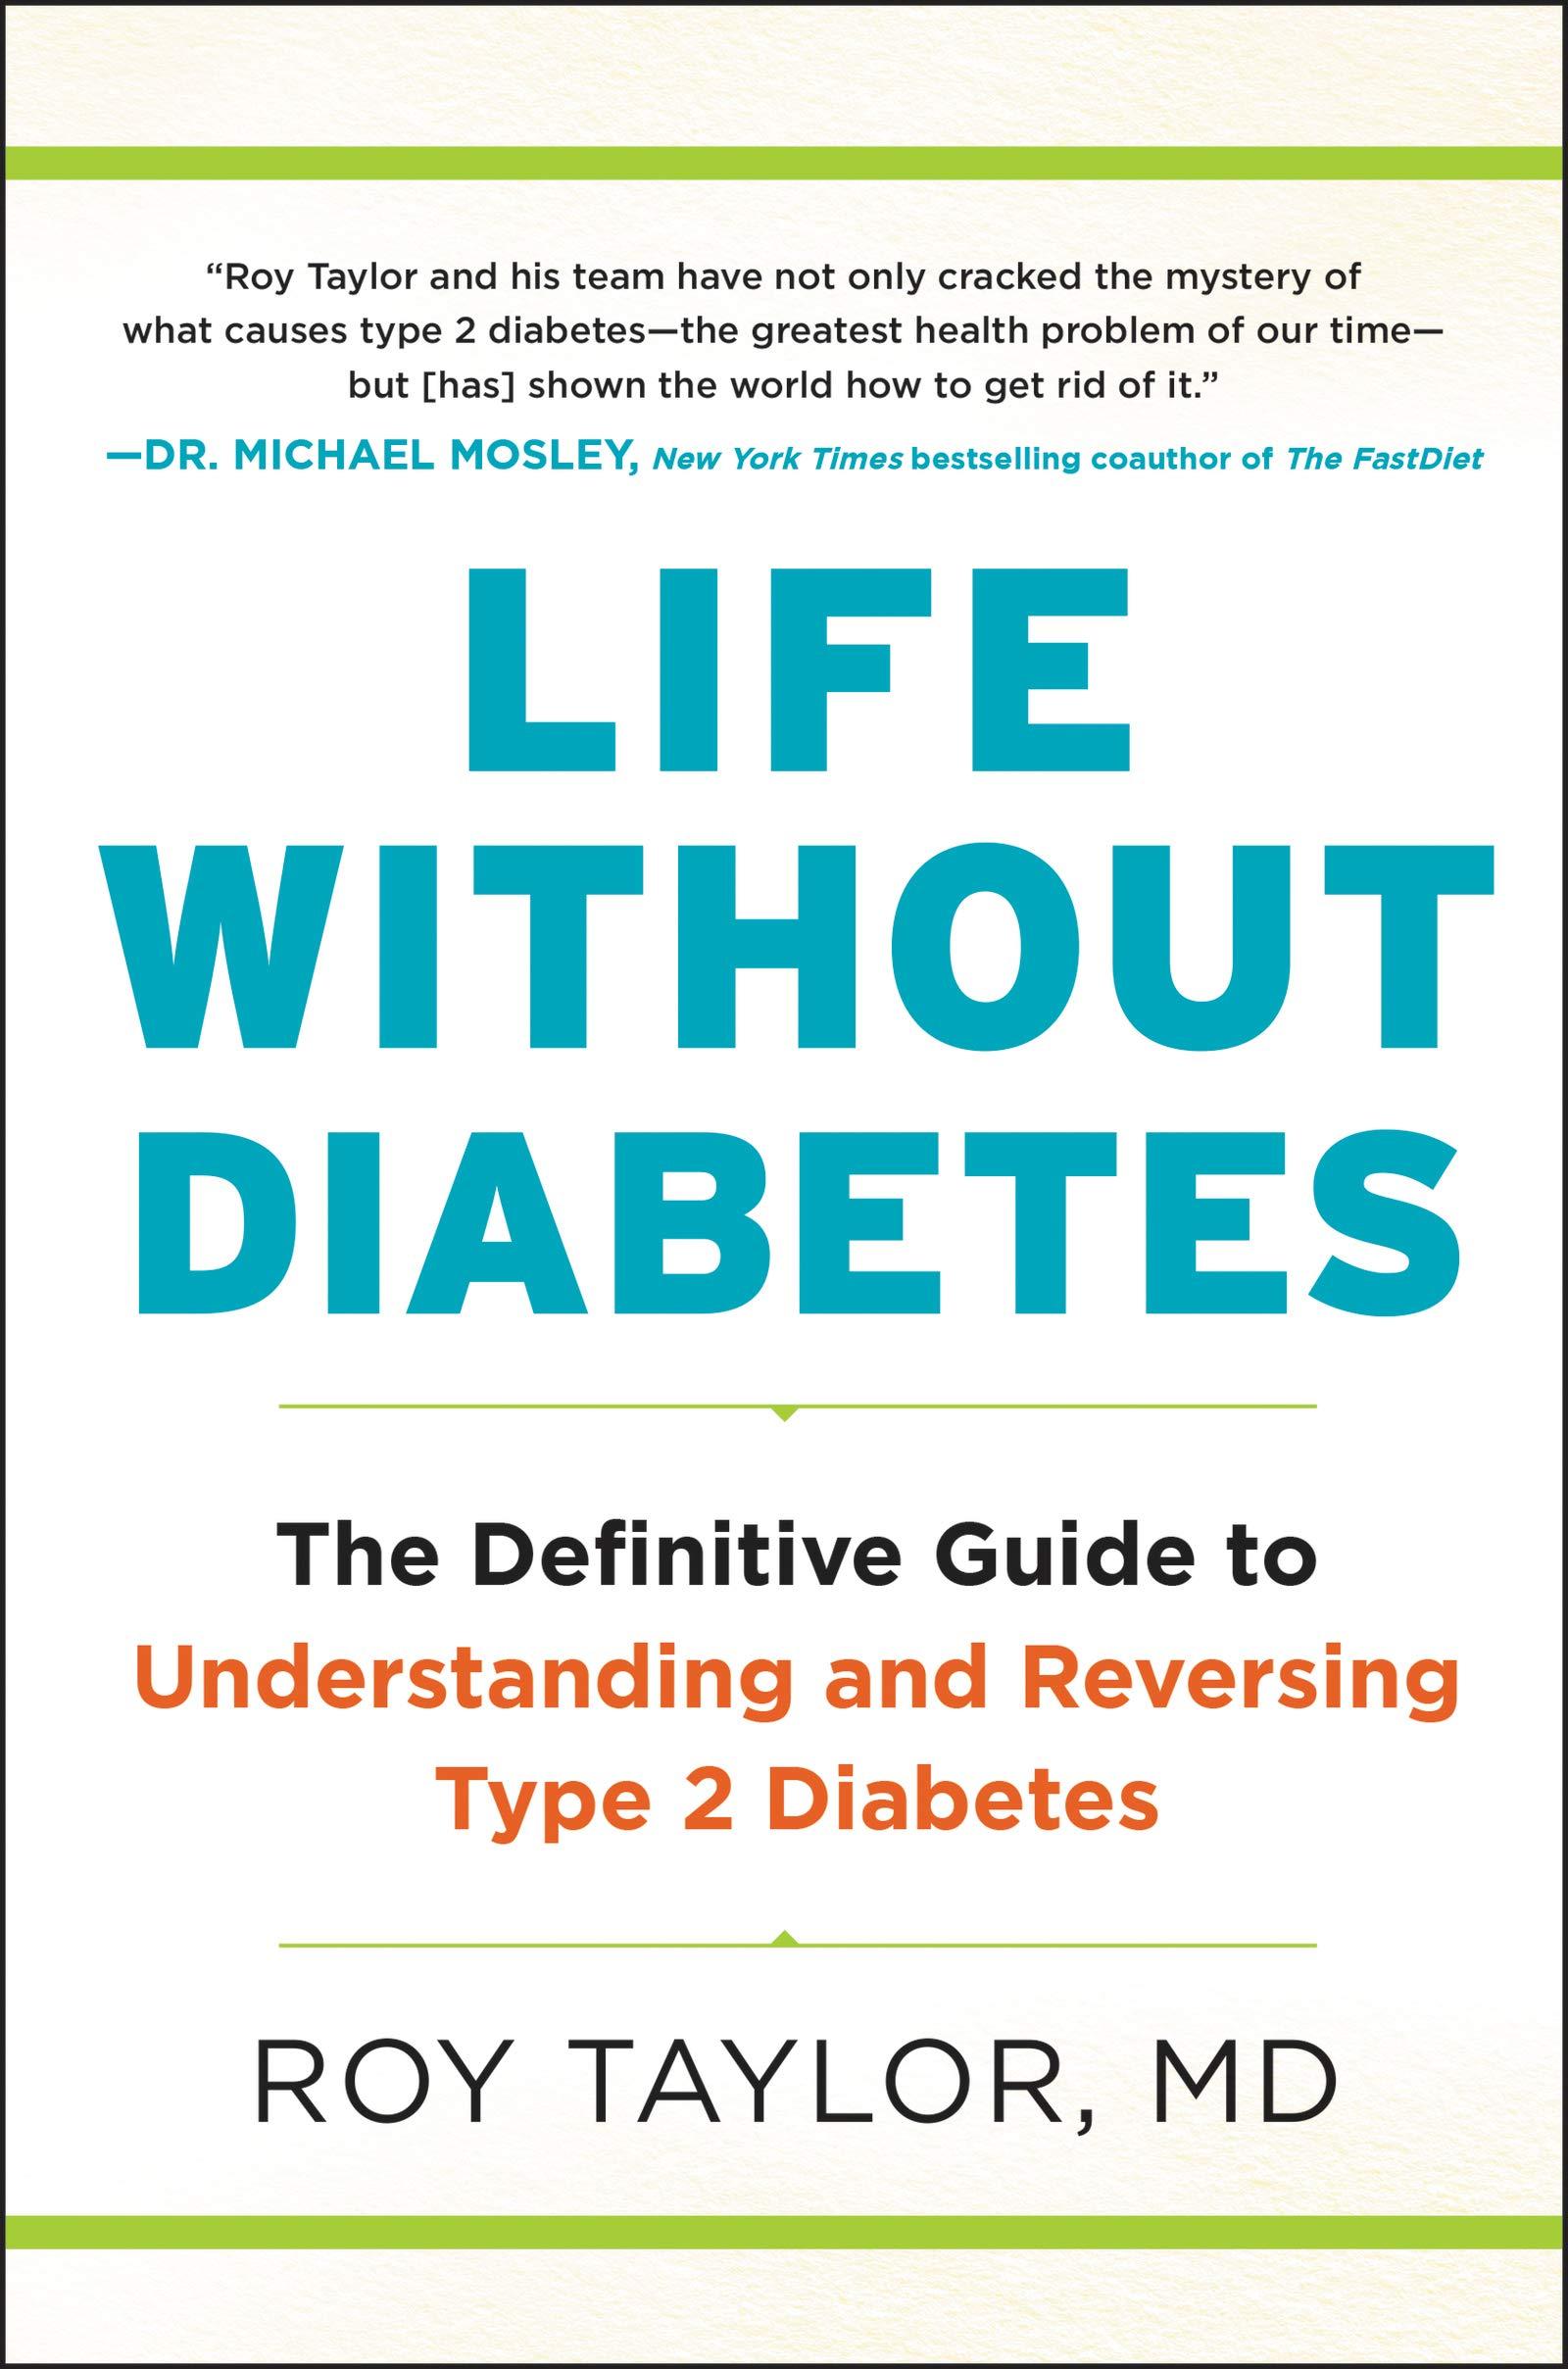 22diabetes reversa